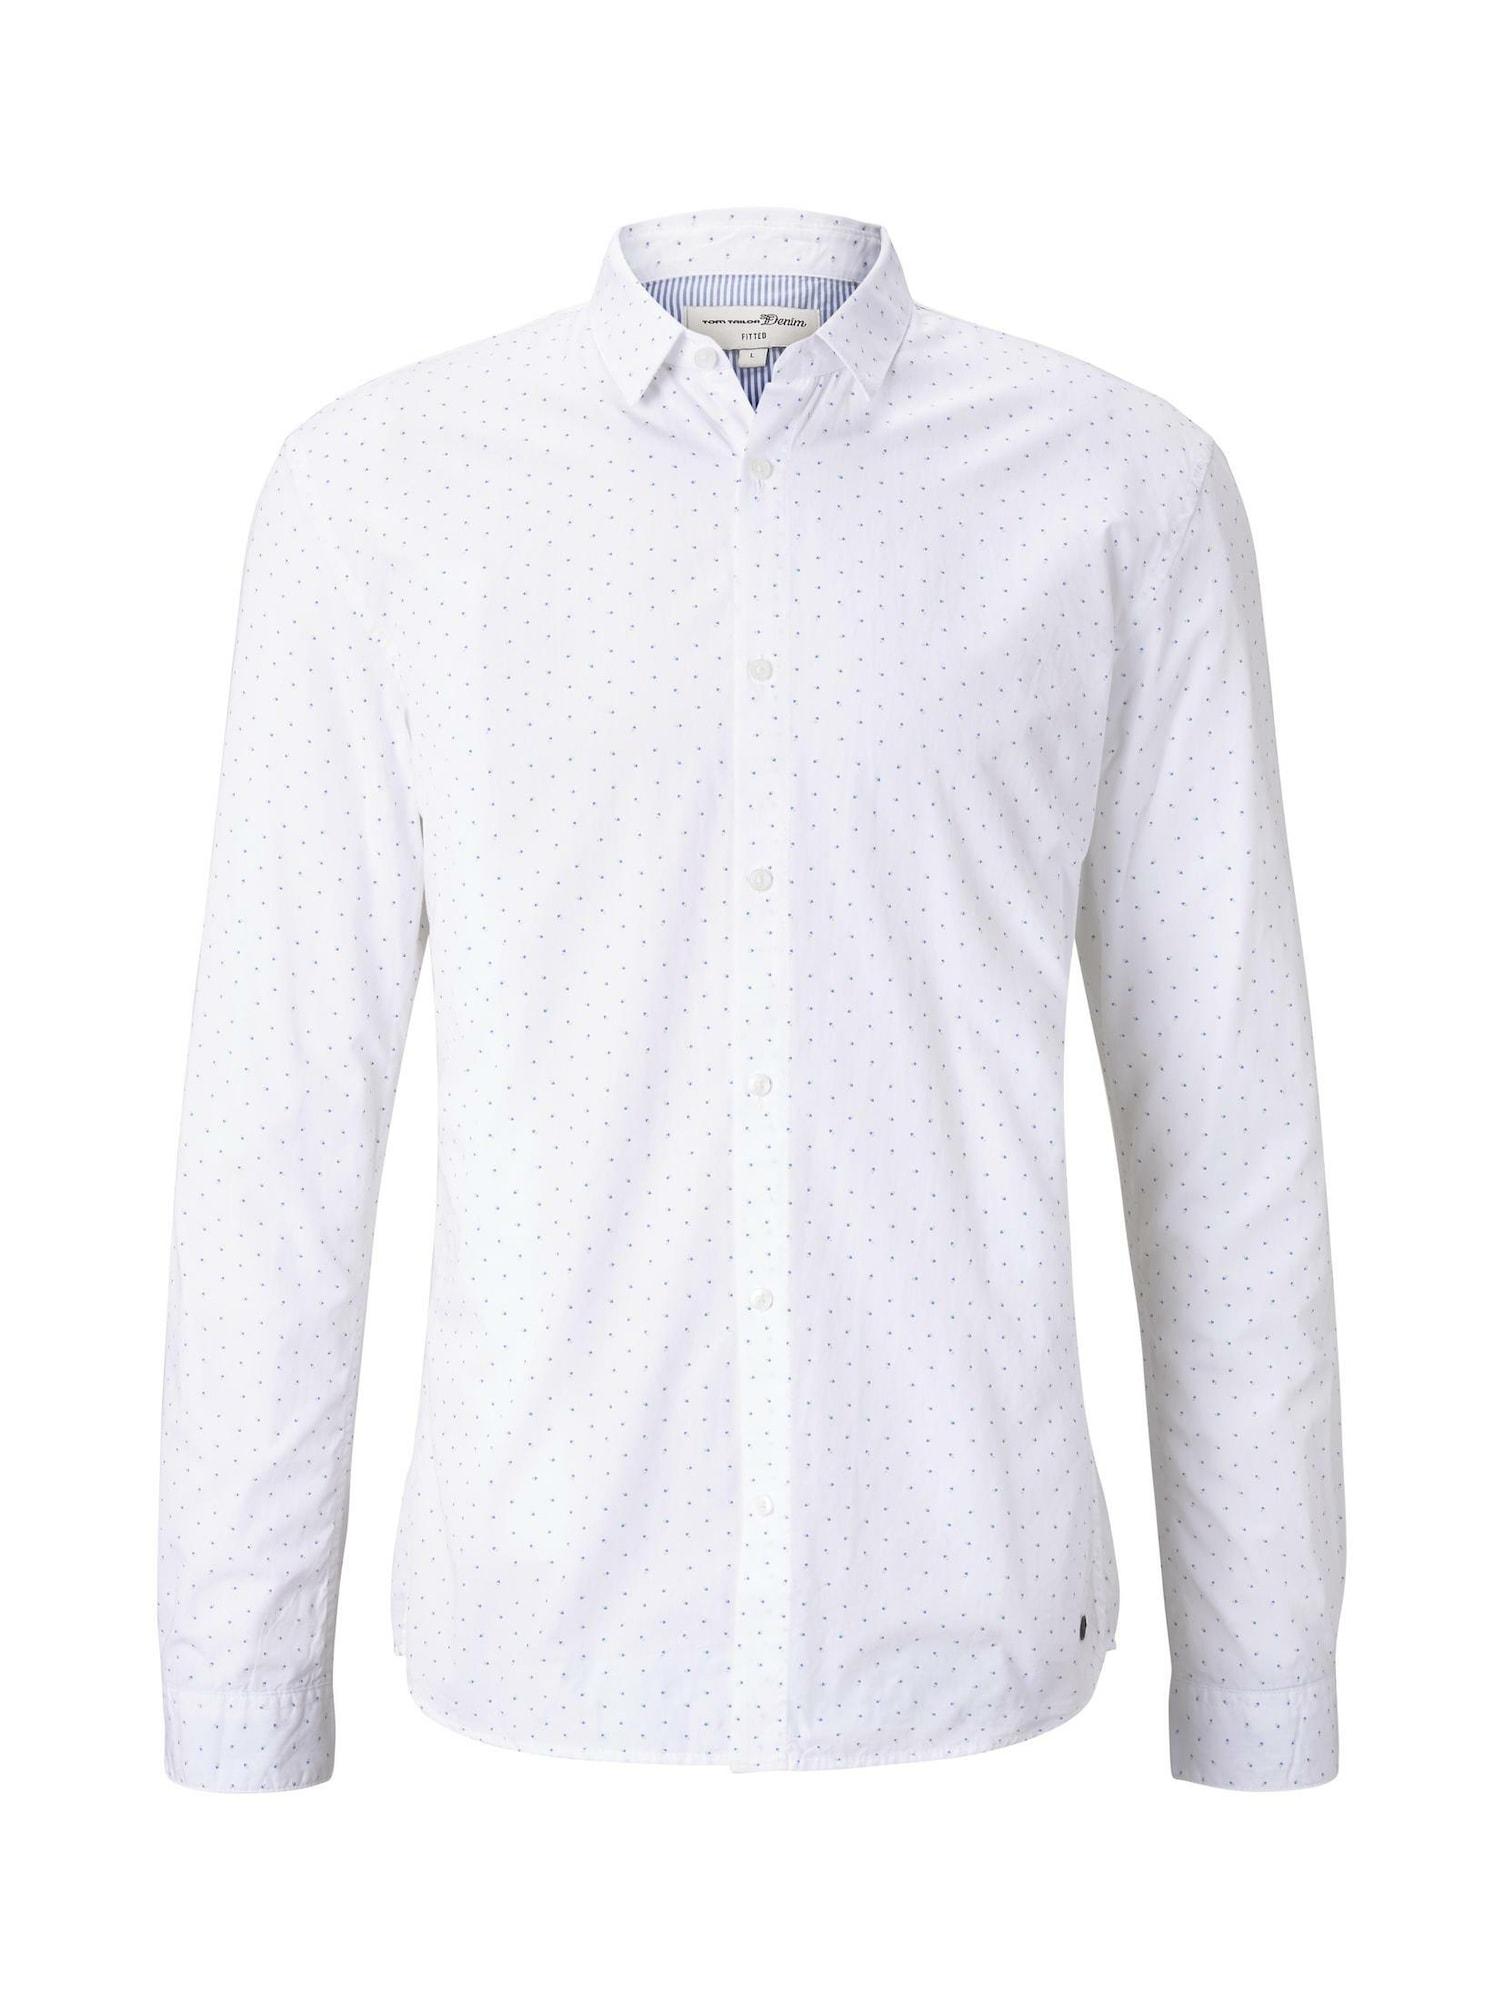 TOM TAILOR DENIM Košile  bílá